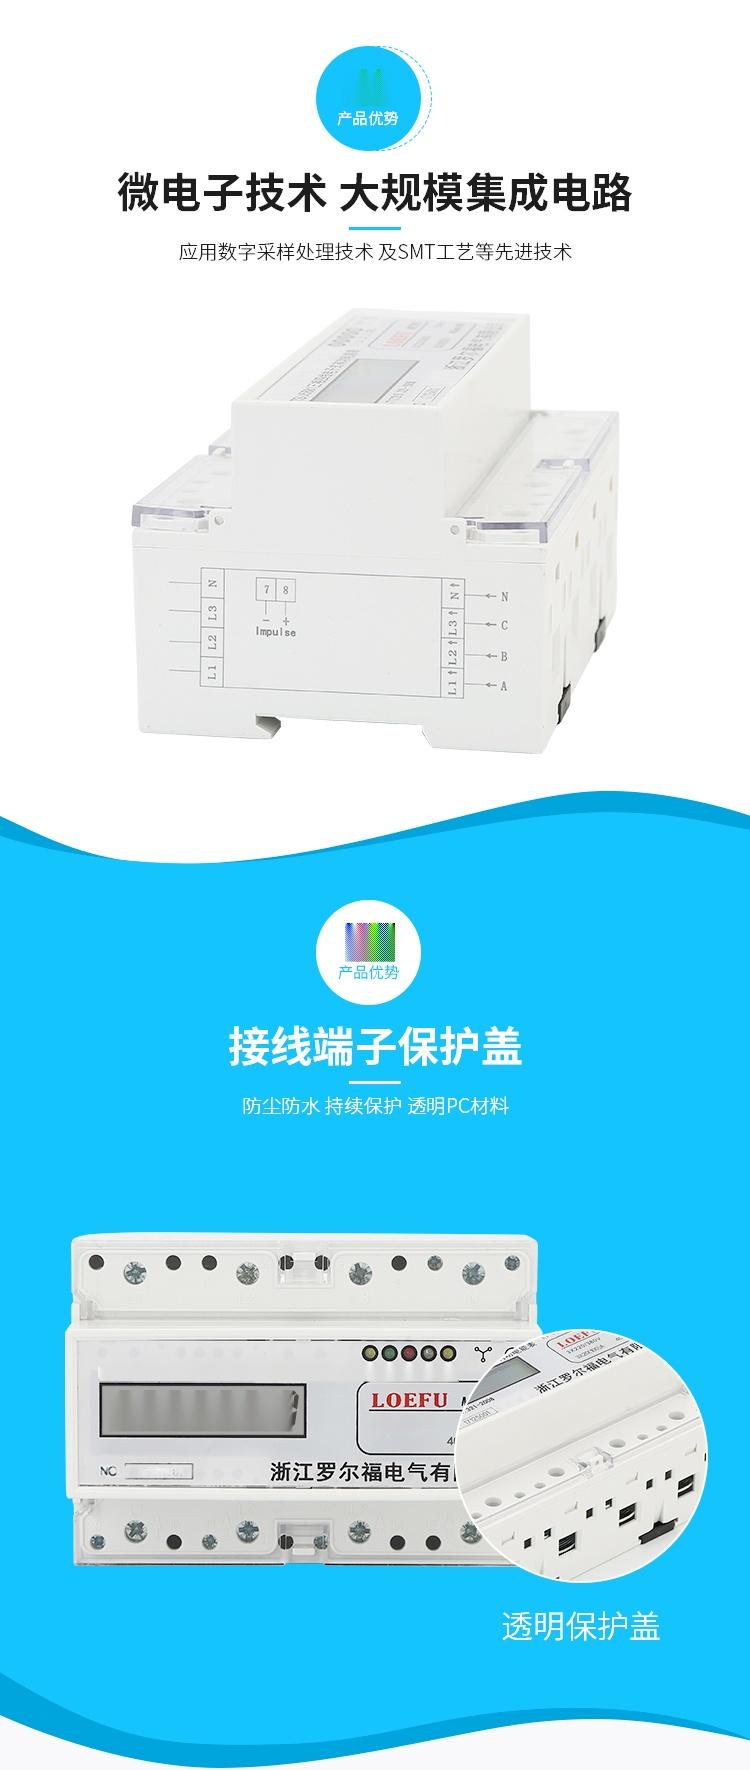 7P-DTSU5881-液晶顯示_03.jpg